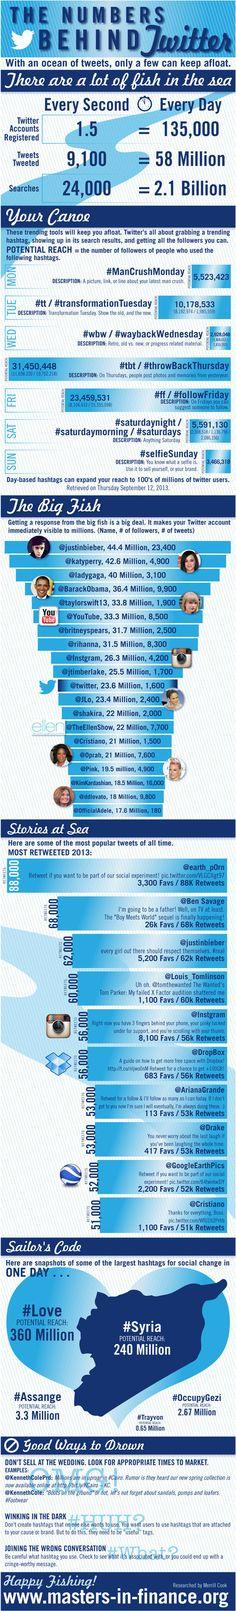 60 Sensational #SocialMedia Facts and Statistics on #Twitter in 2013 | @Jeff Bullas's blog